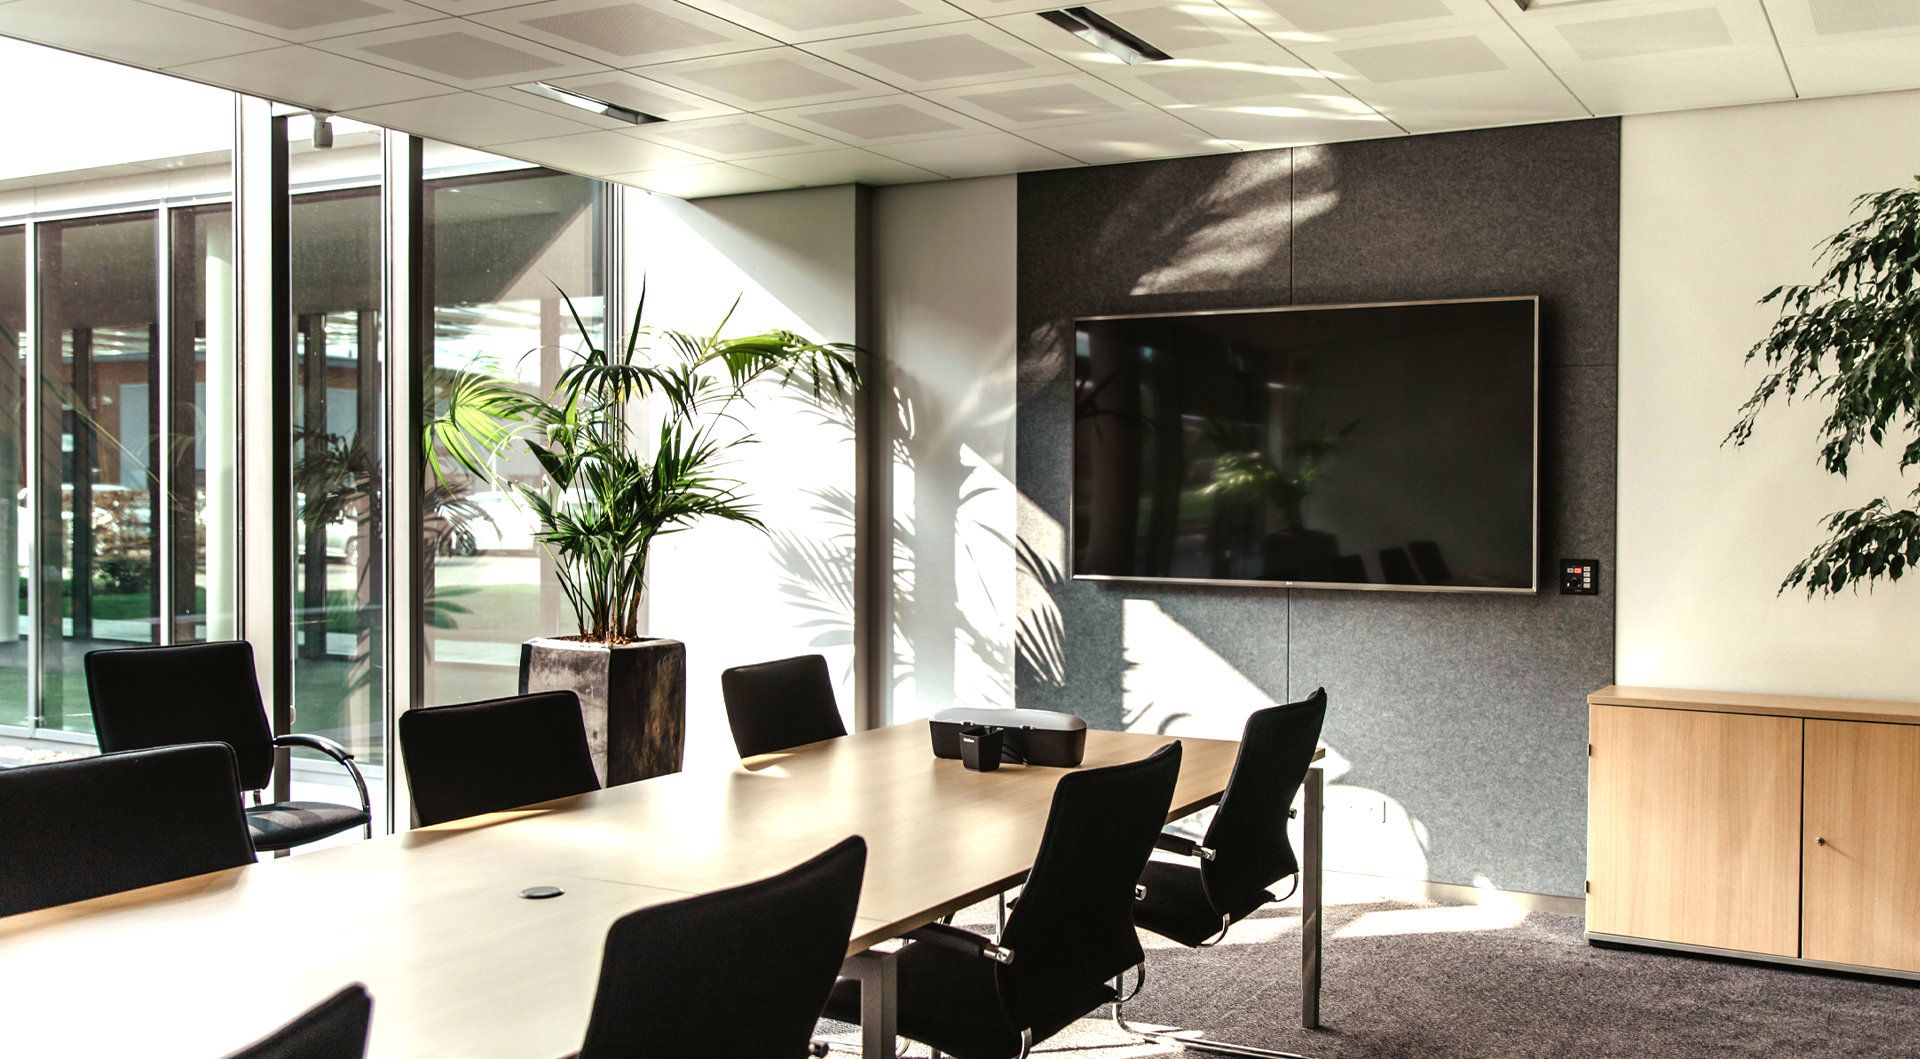 Benq LK990 beamer/projector Plafond/vloergemonteerde projector 6000 ANSI lumens DLP 2160p (3840x2160) Zwart - Case studie de vries